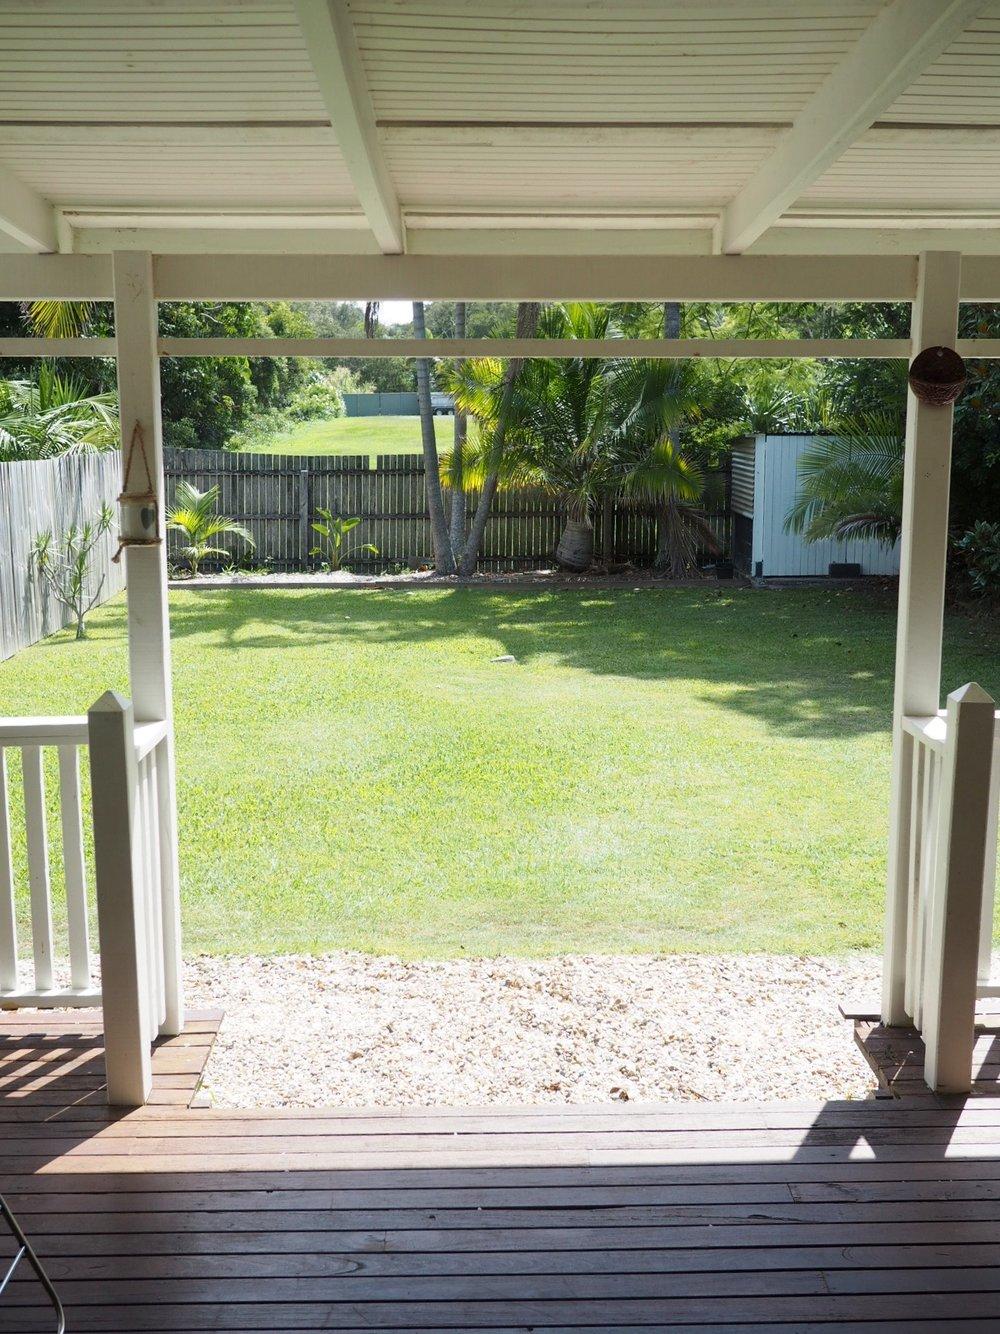 My rental home in Australia